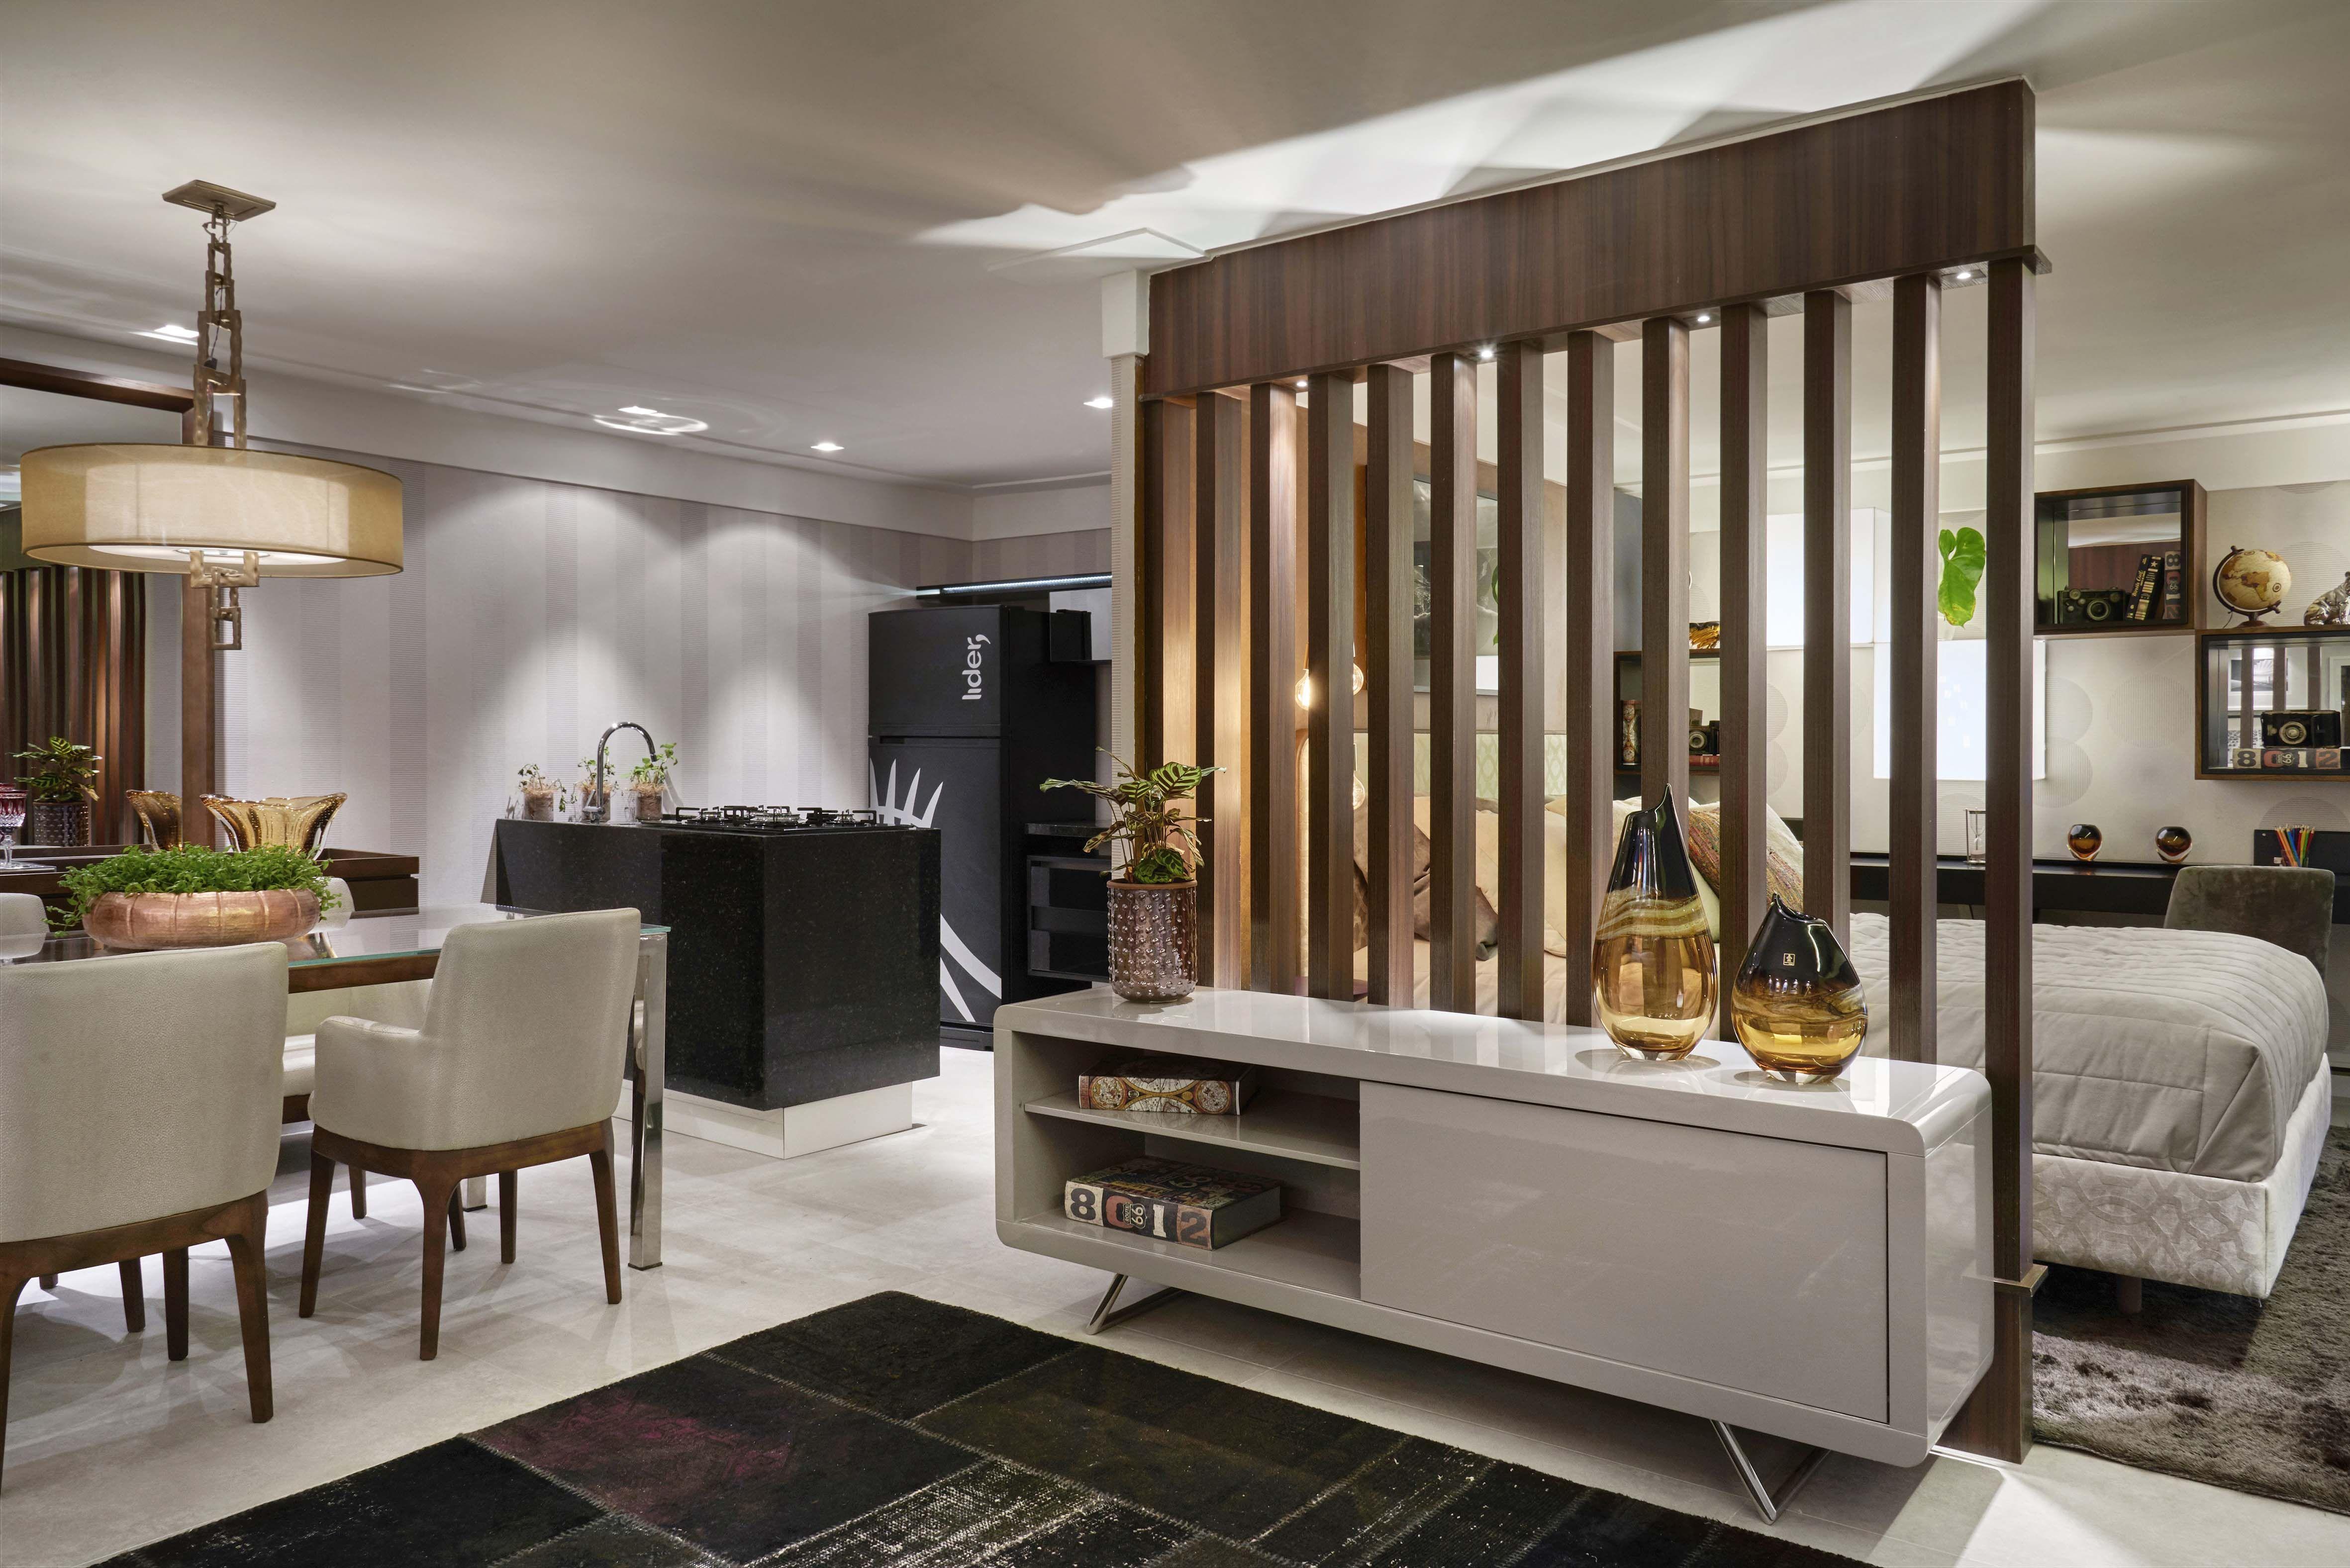 Túlio Gomes E Luiz Cruvinel   Flat Moderno 2 · Apartment DesignHome Decor GamesArquiteturaModernInteriorsHomemade ...